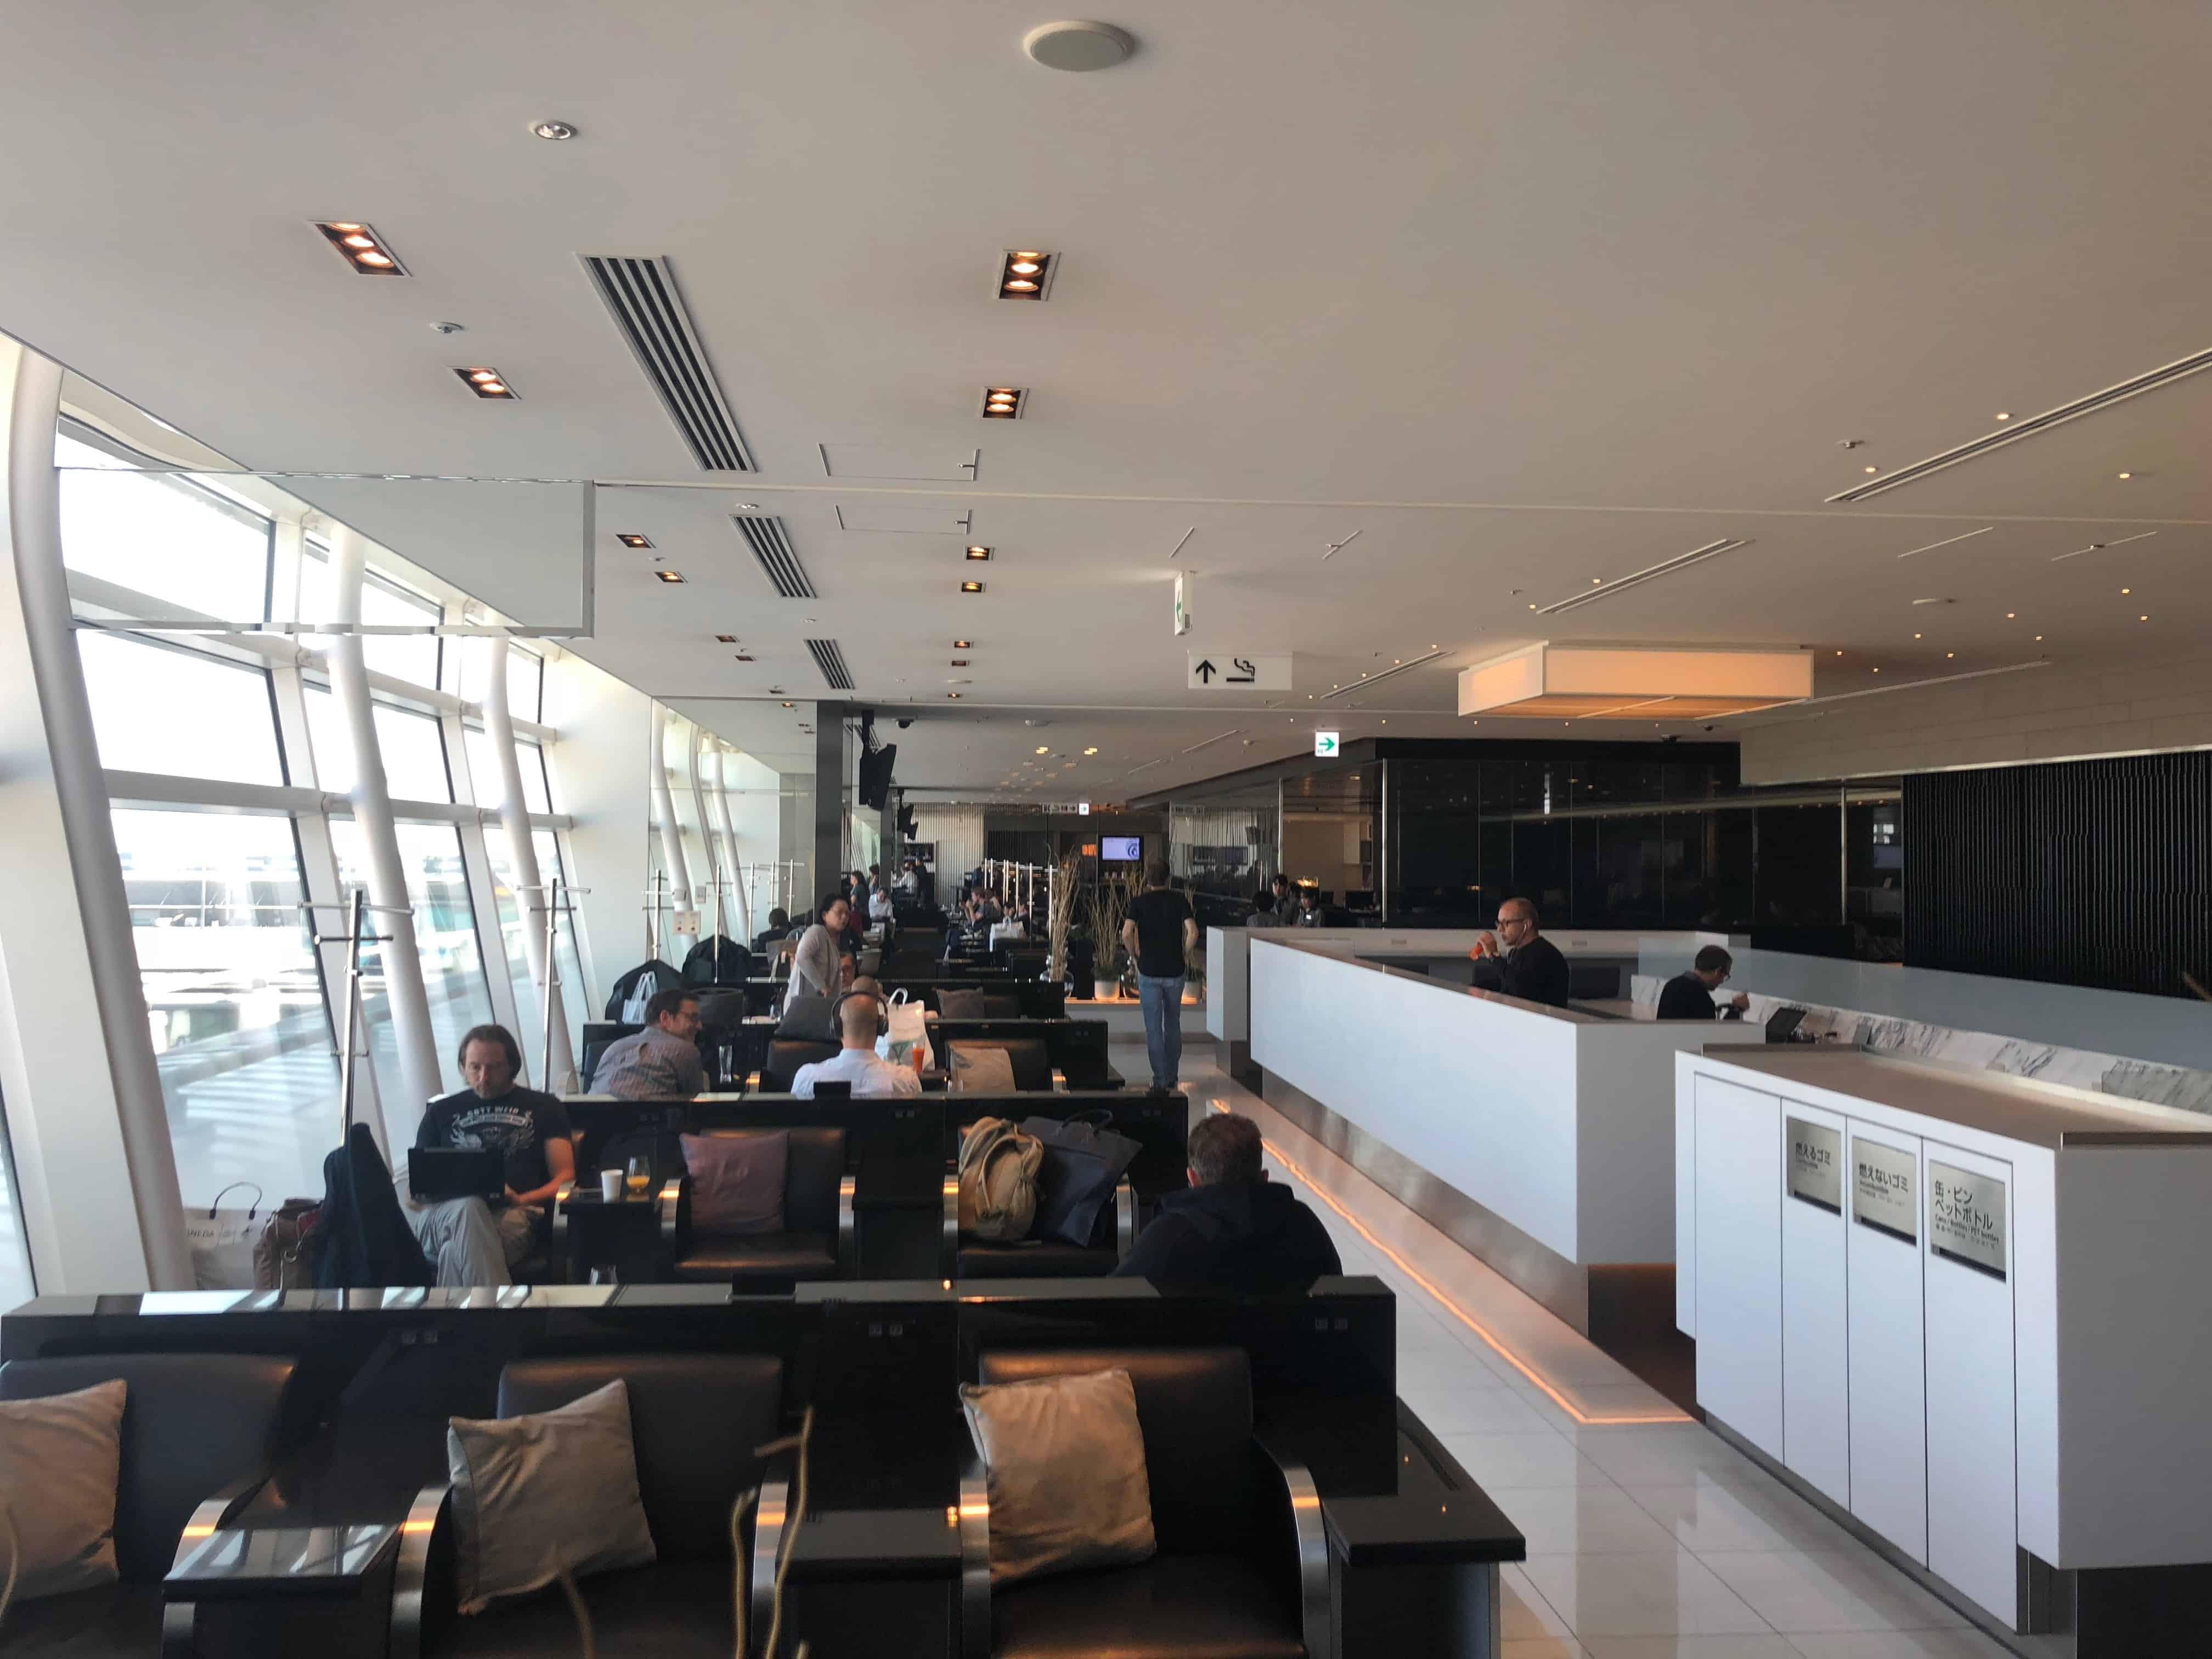 ANA Economy Bewertung Lounge